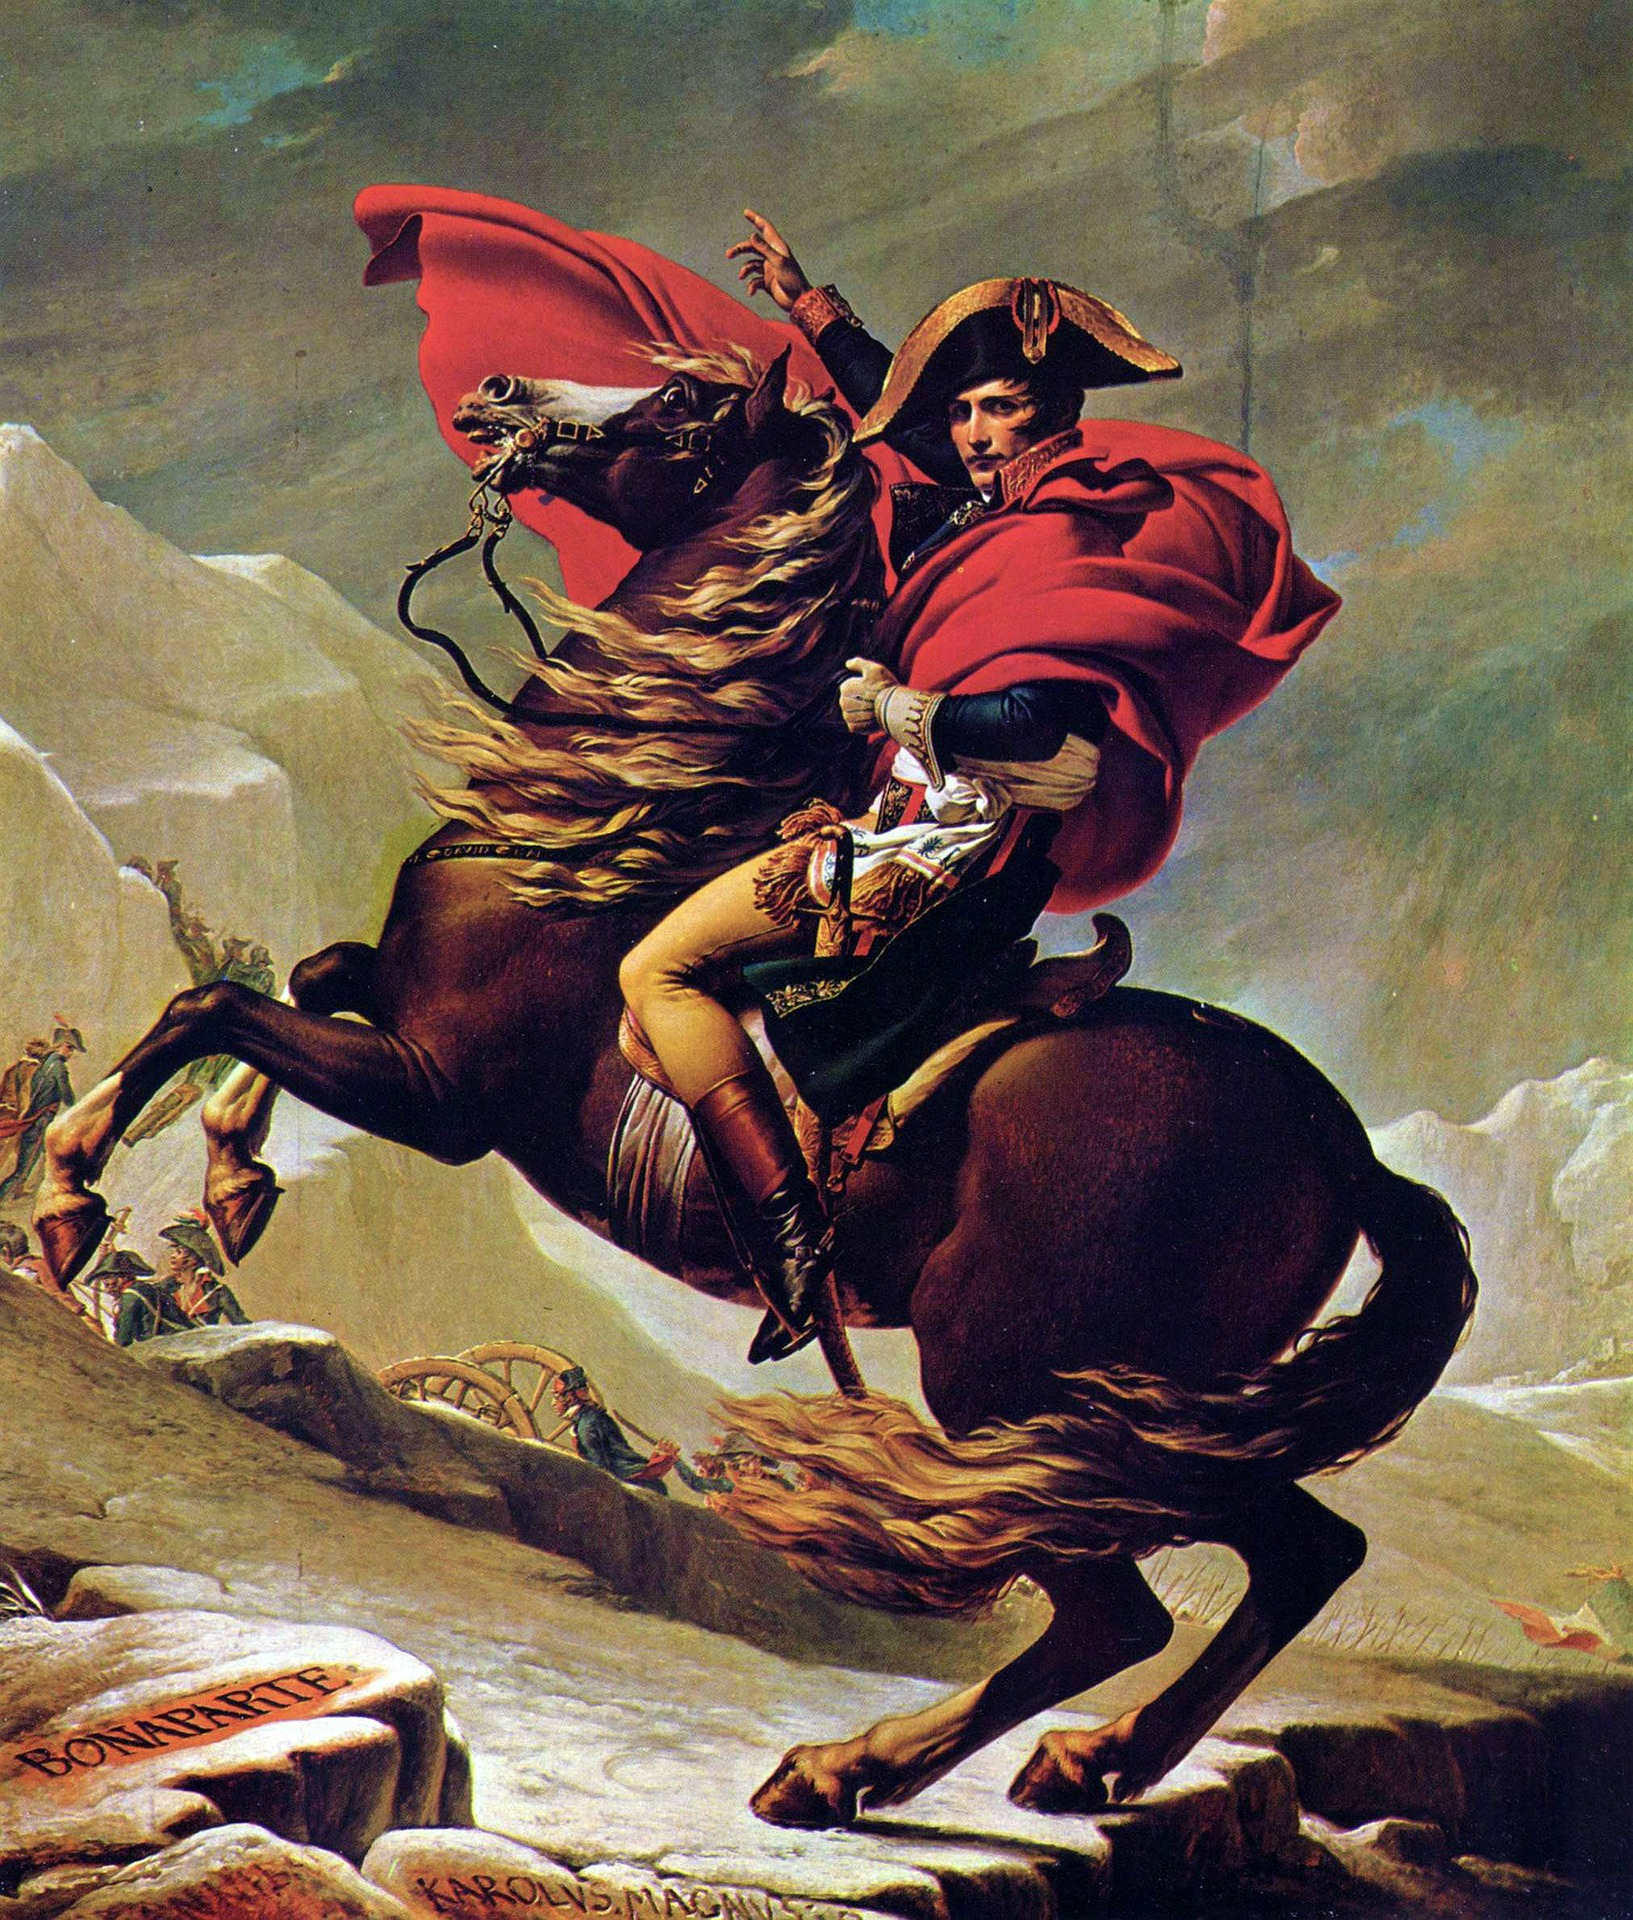 Europa i Napoleons mektige hender